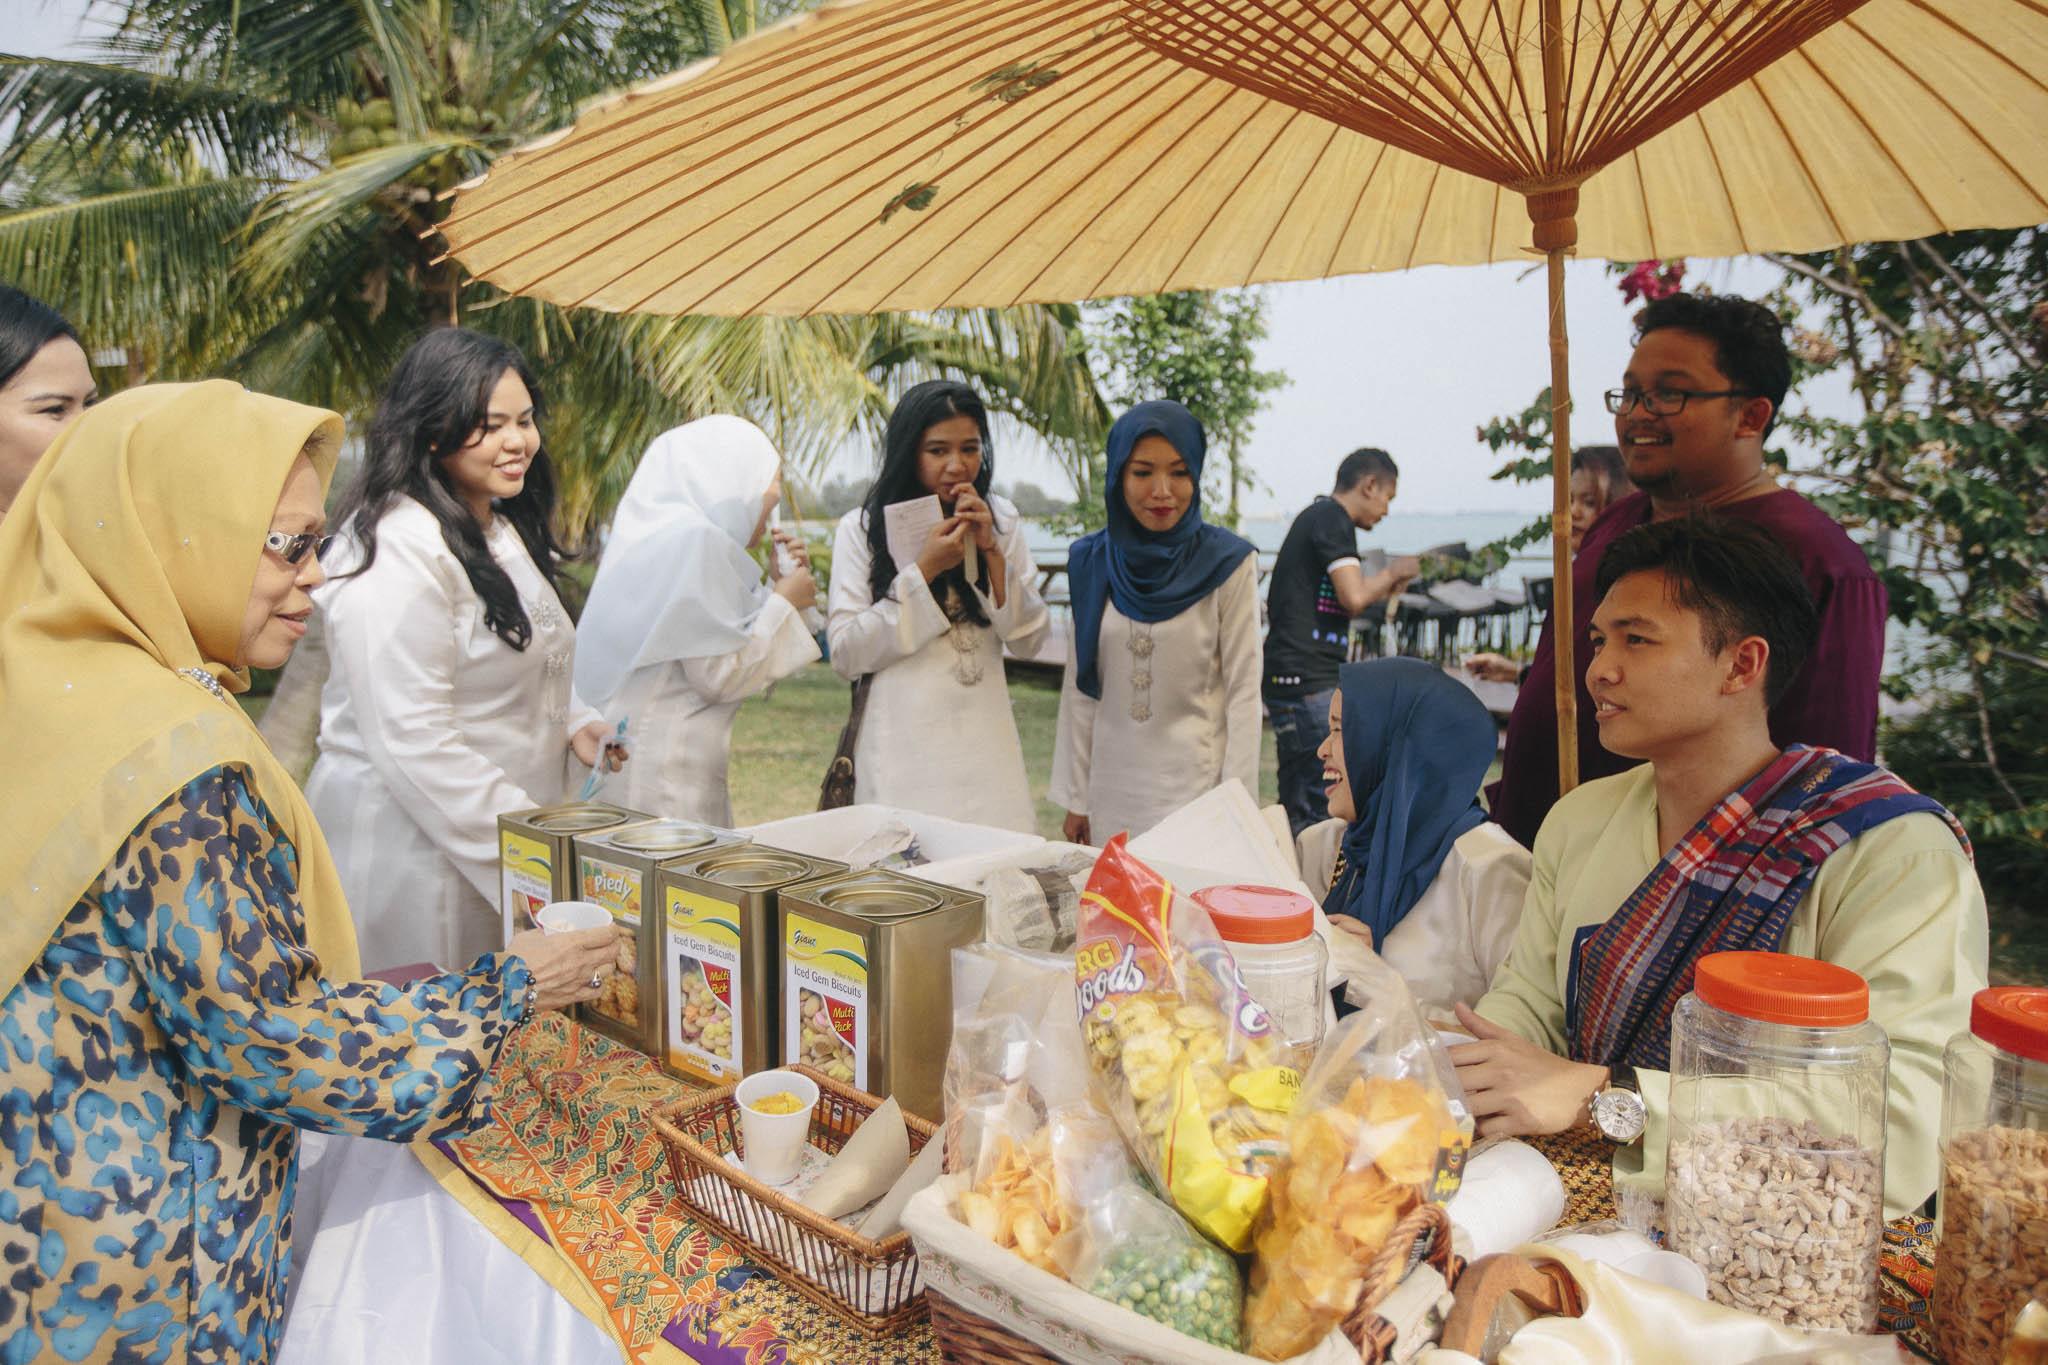 singapore-wedding-photographer-travel-khairul-atikah-53.jpg